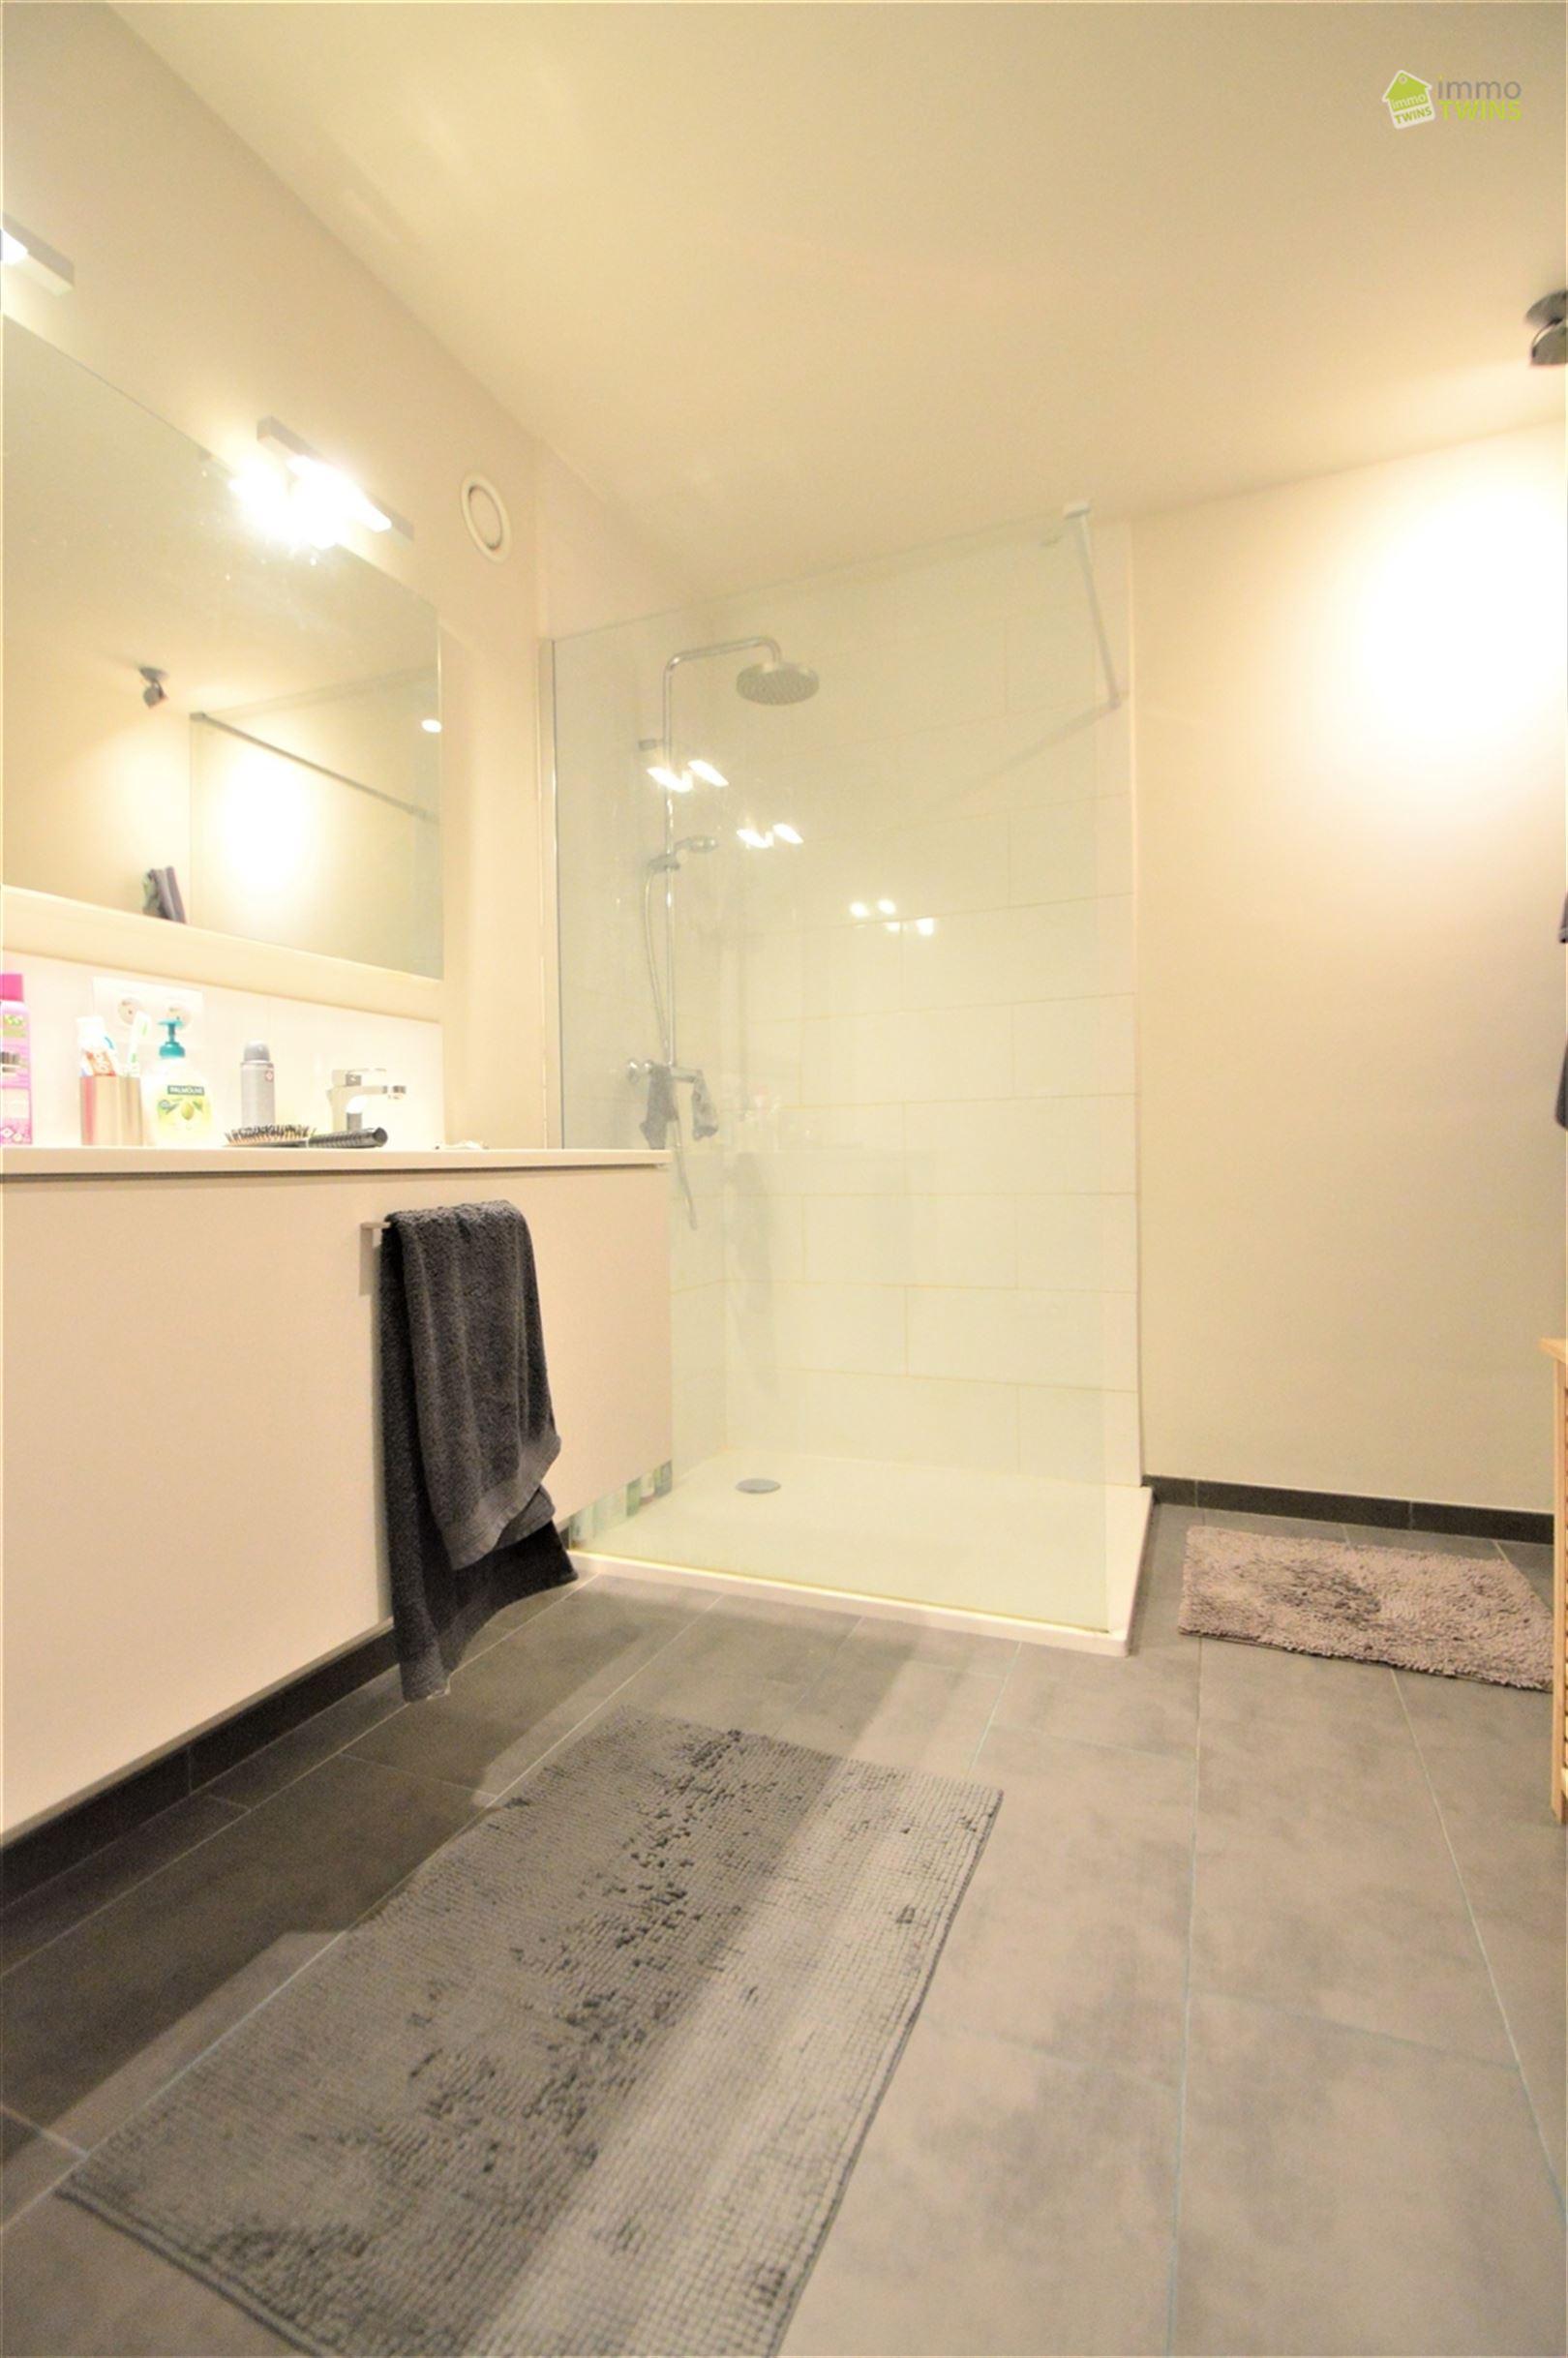 Foto 8 : Appartement te 9200 SINT-GILLIS-DENDERMONDE (België) - Prijs € 835